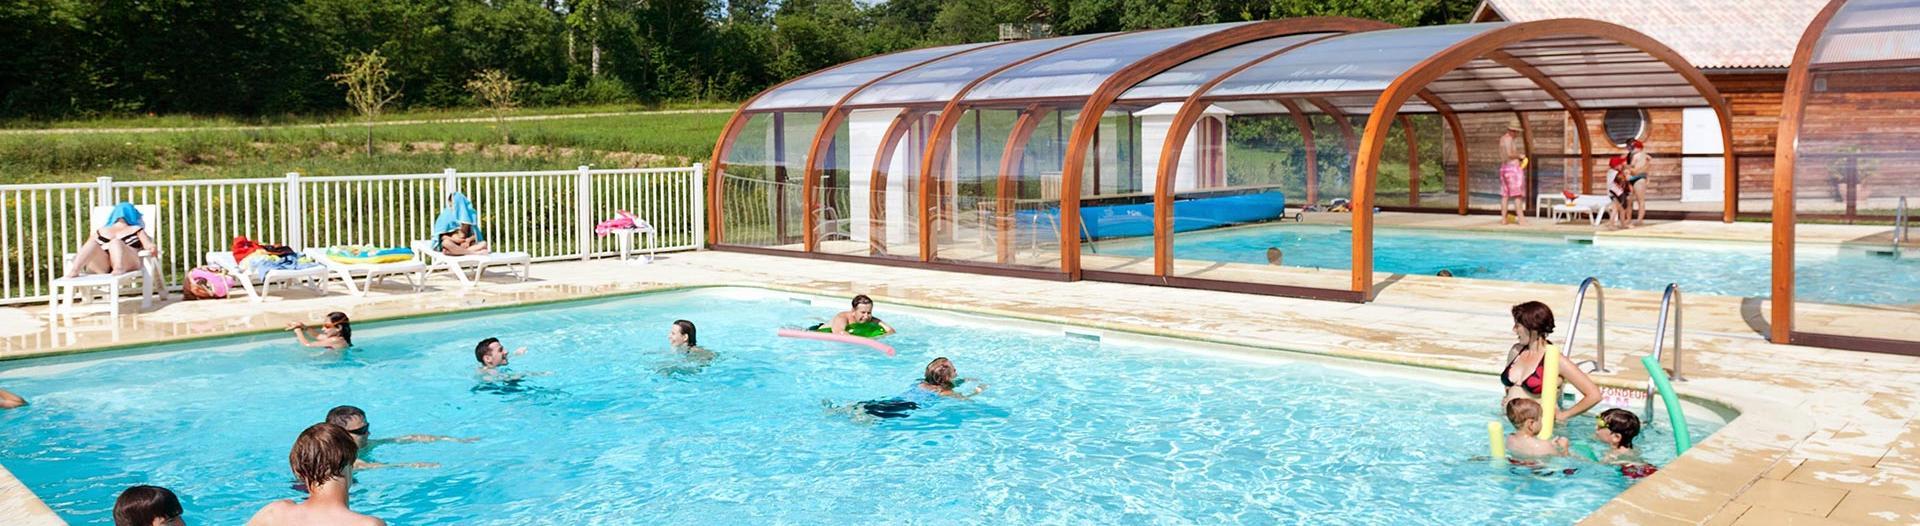 slider-Camping Defiplanet piscines